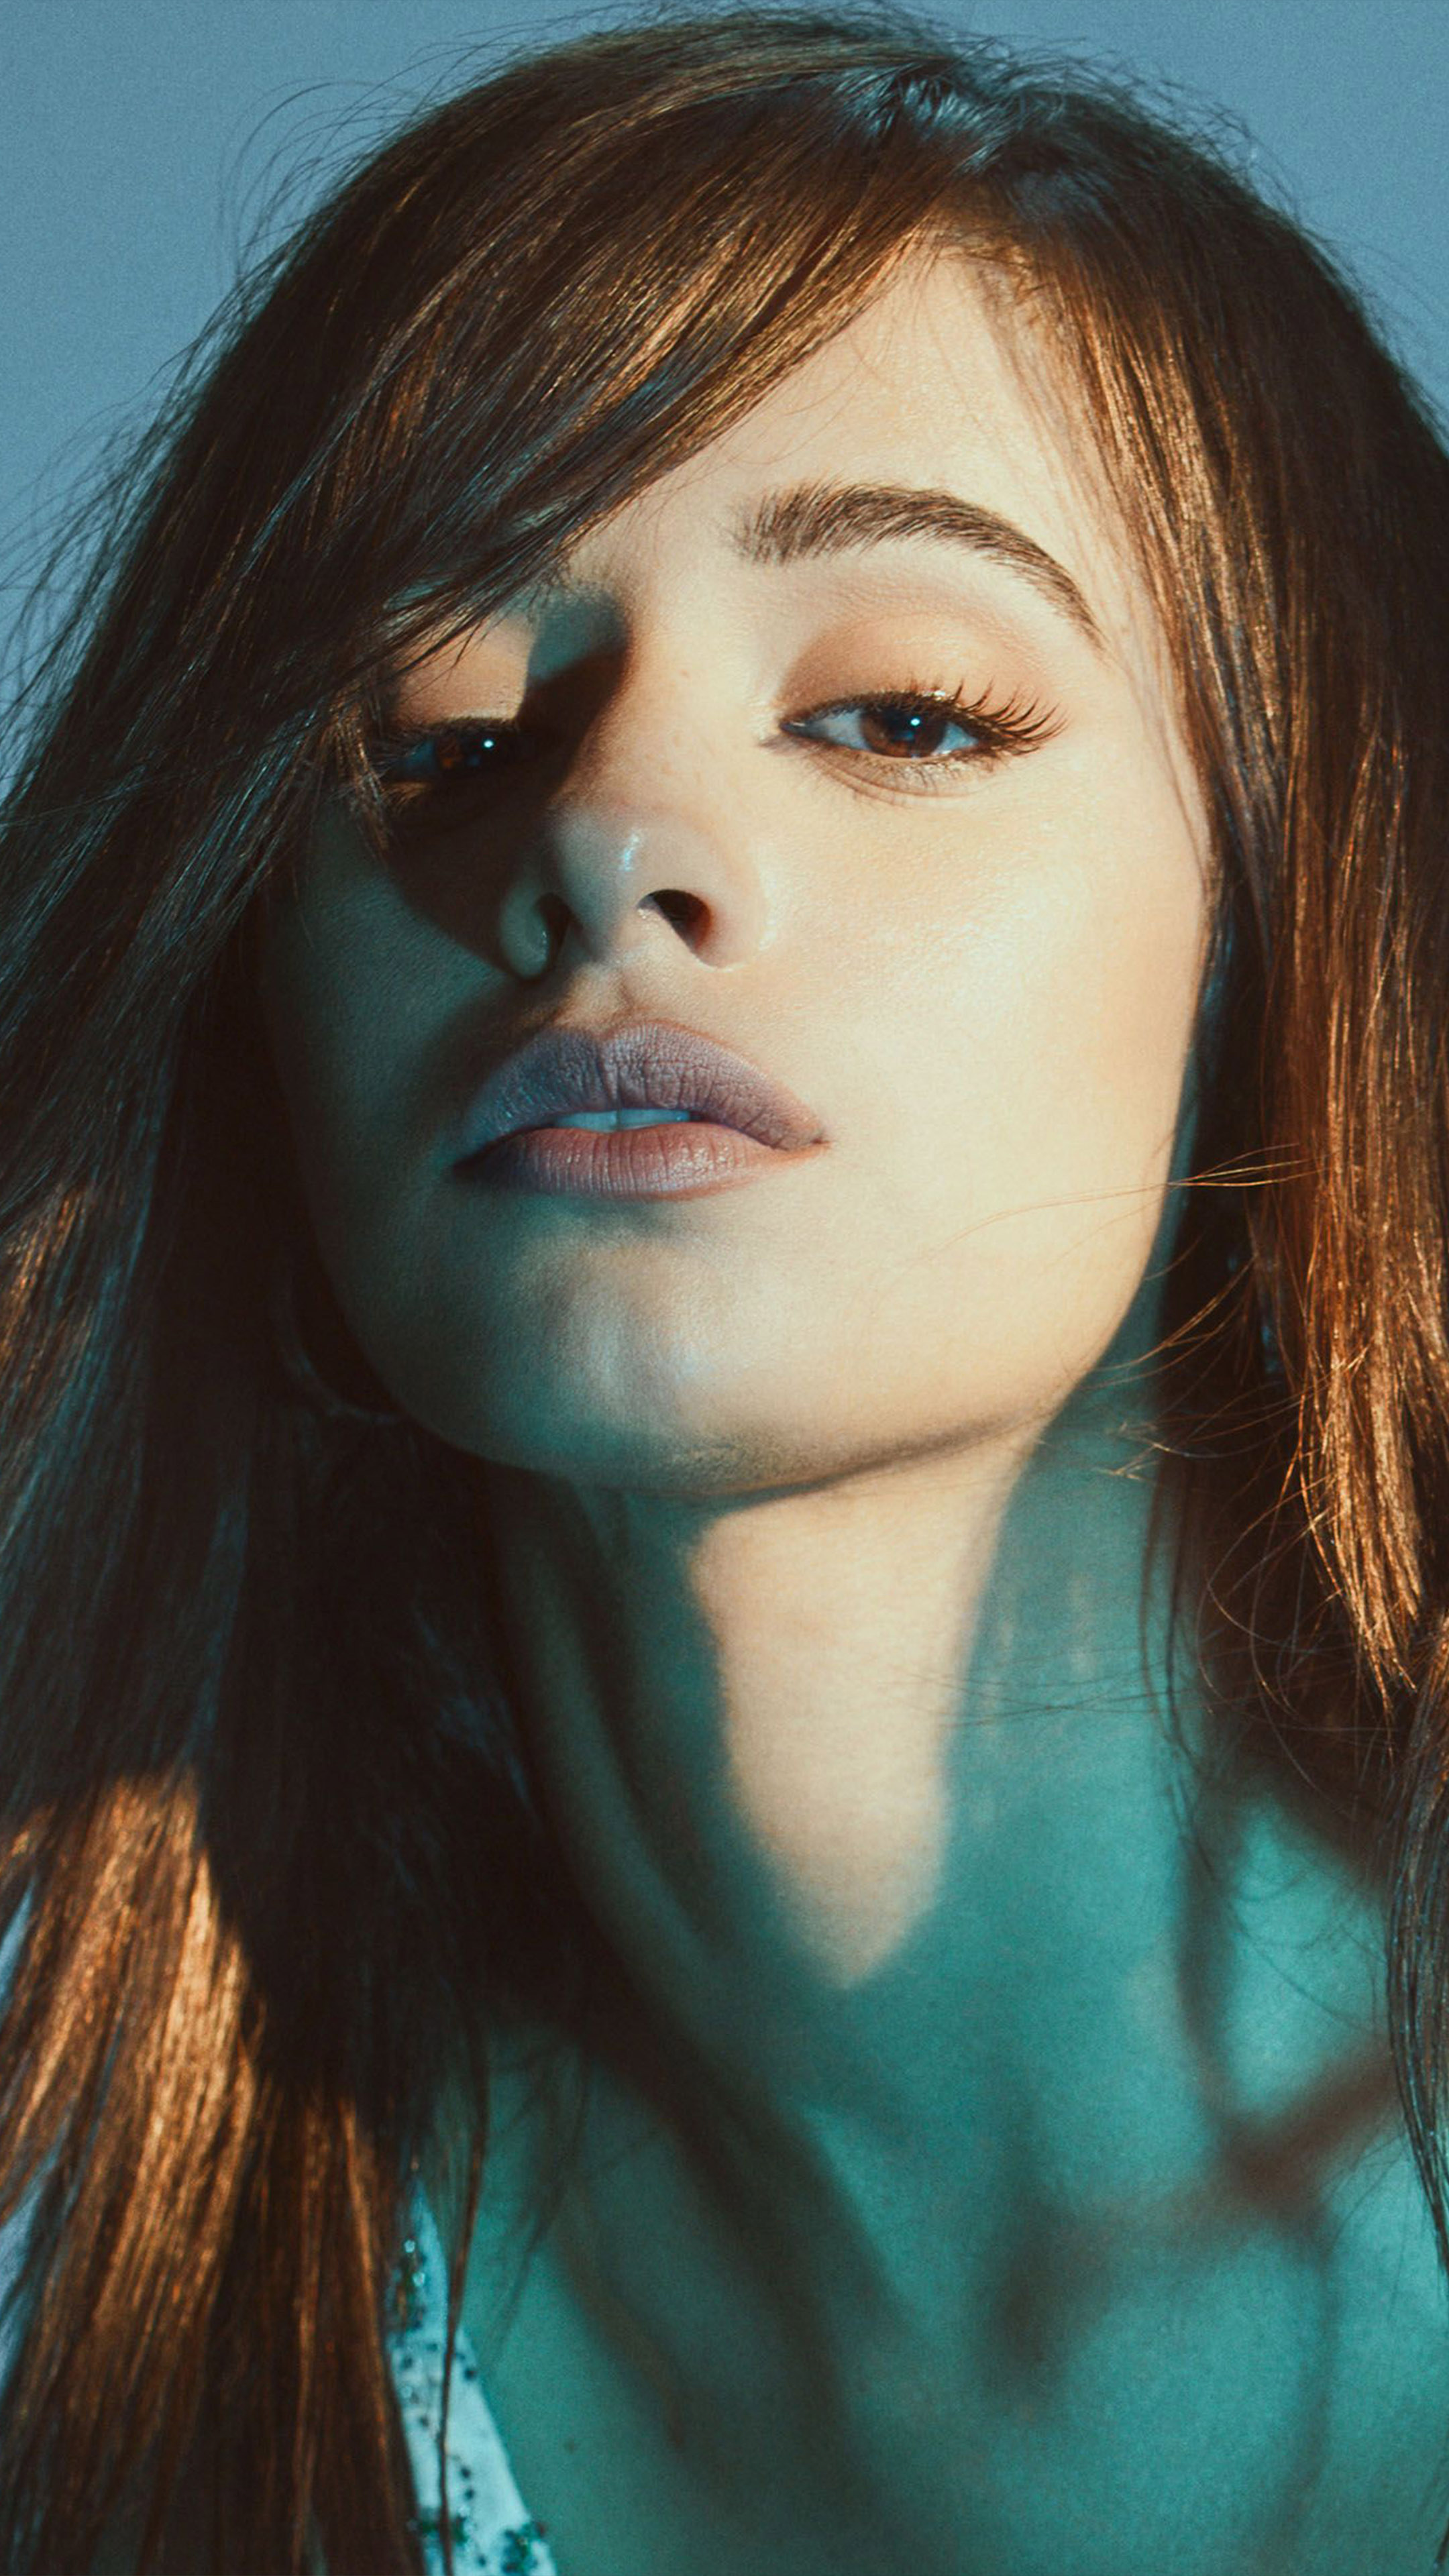 Camila Cabello Elle 2019 4k Ultra Hd Mobile Wallpaper